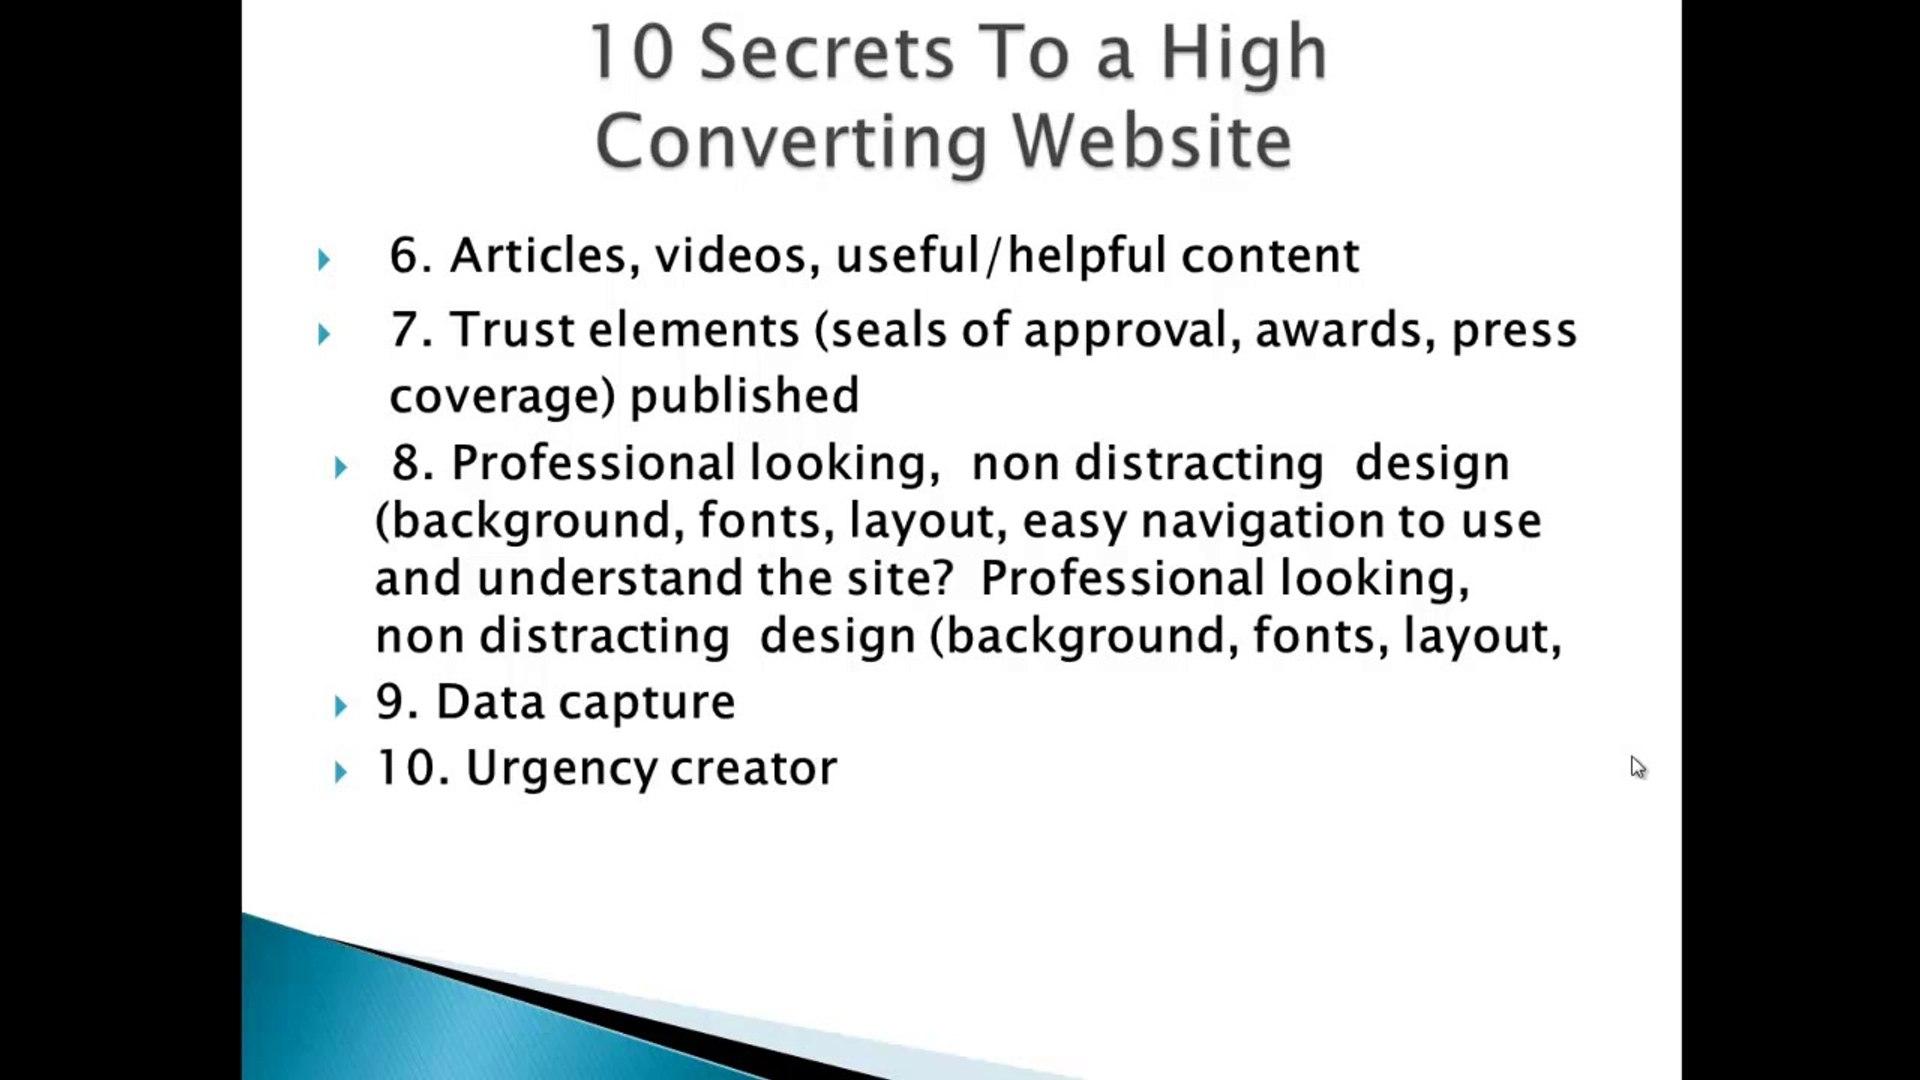 Dental Website Marketing - Top10 Website Conversion Tips Pt2